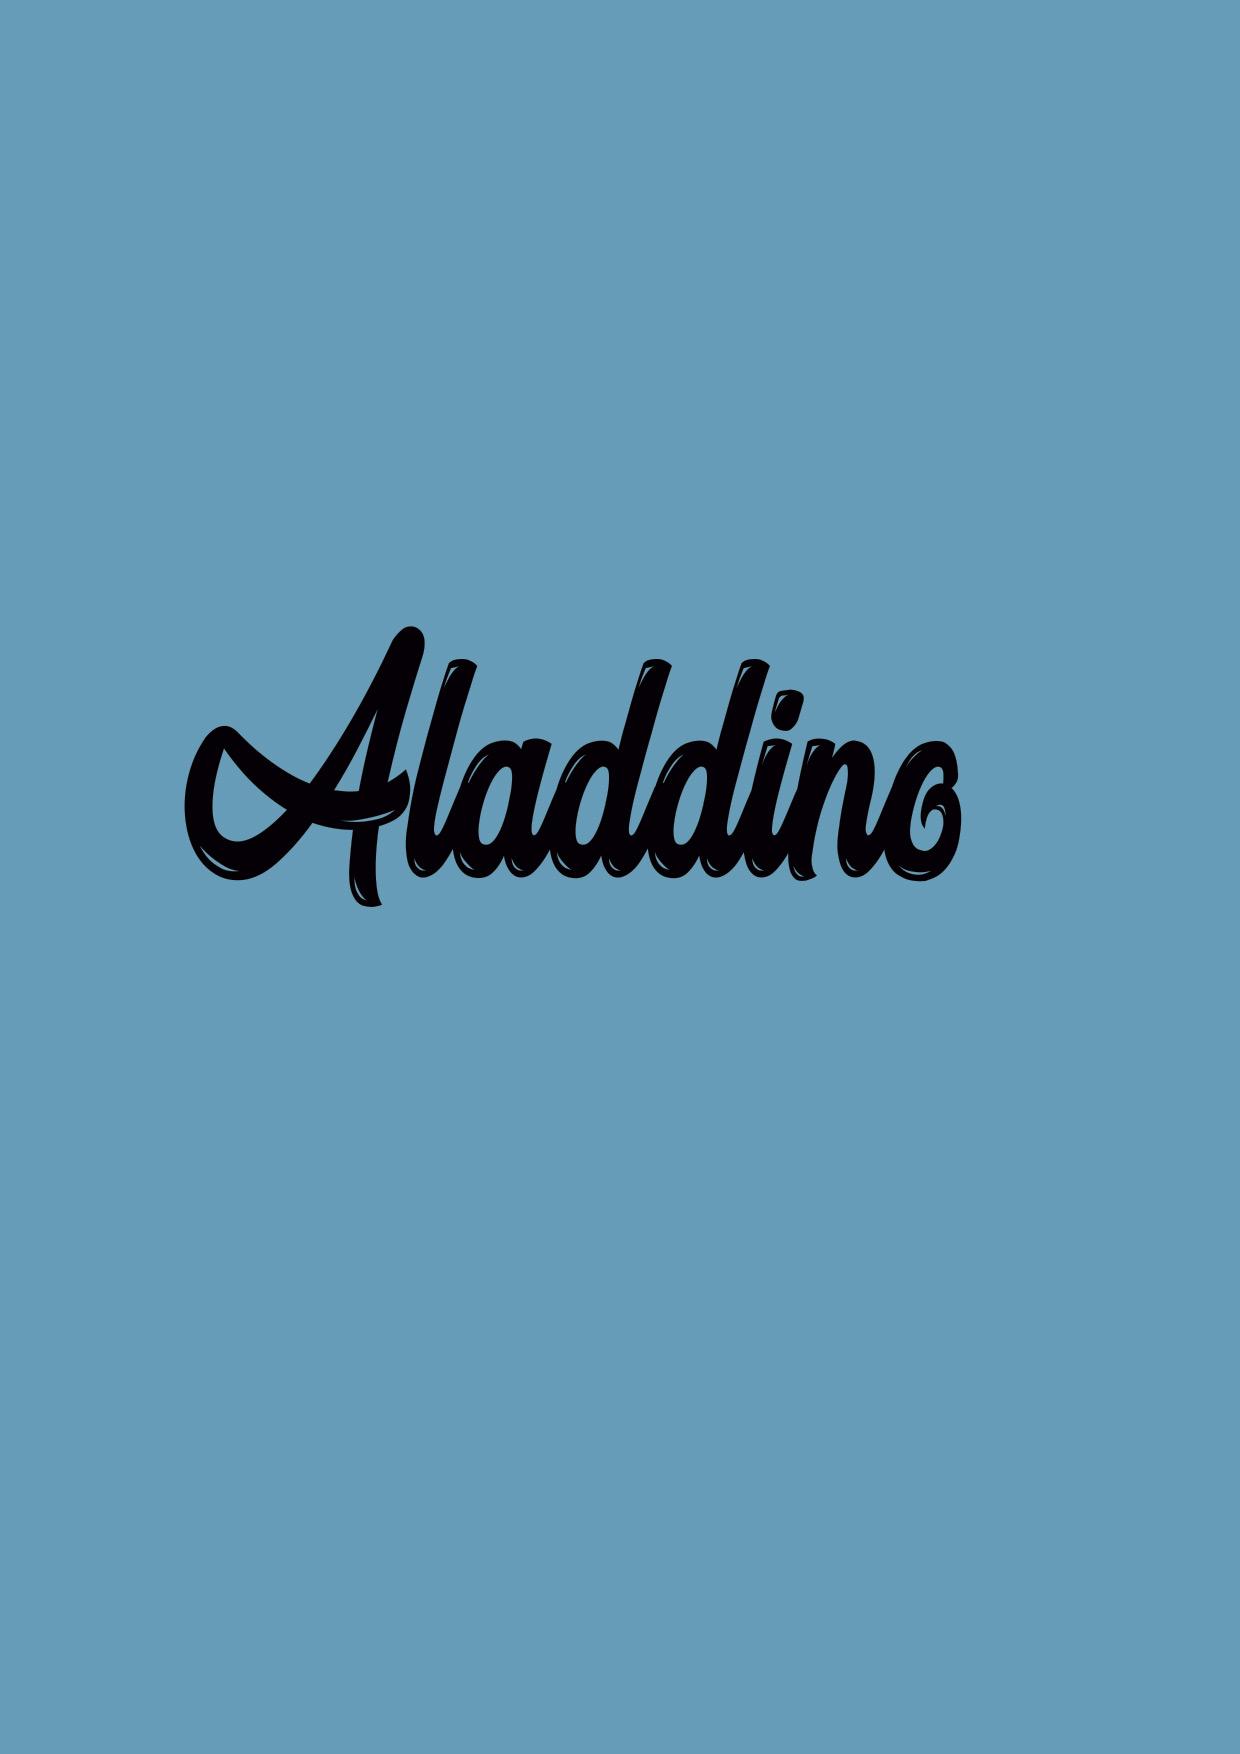 aladdino